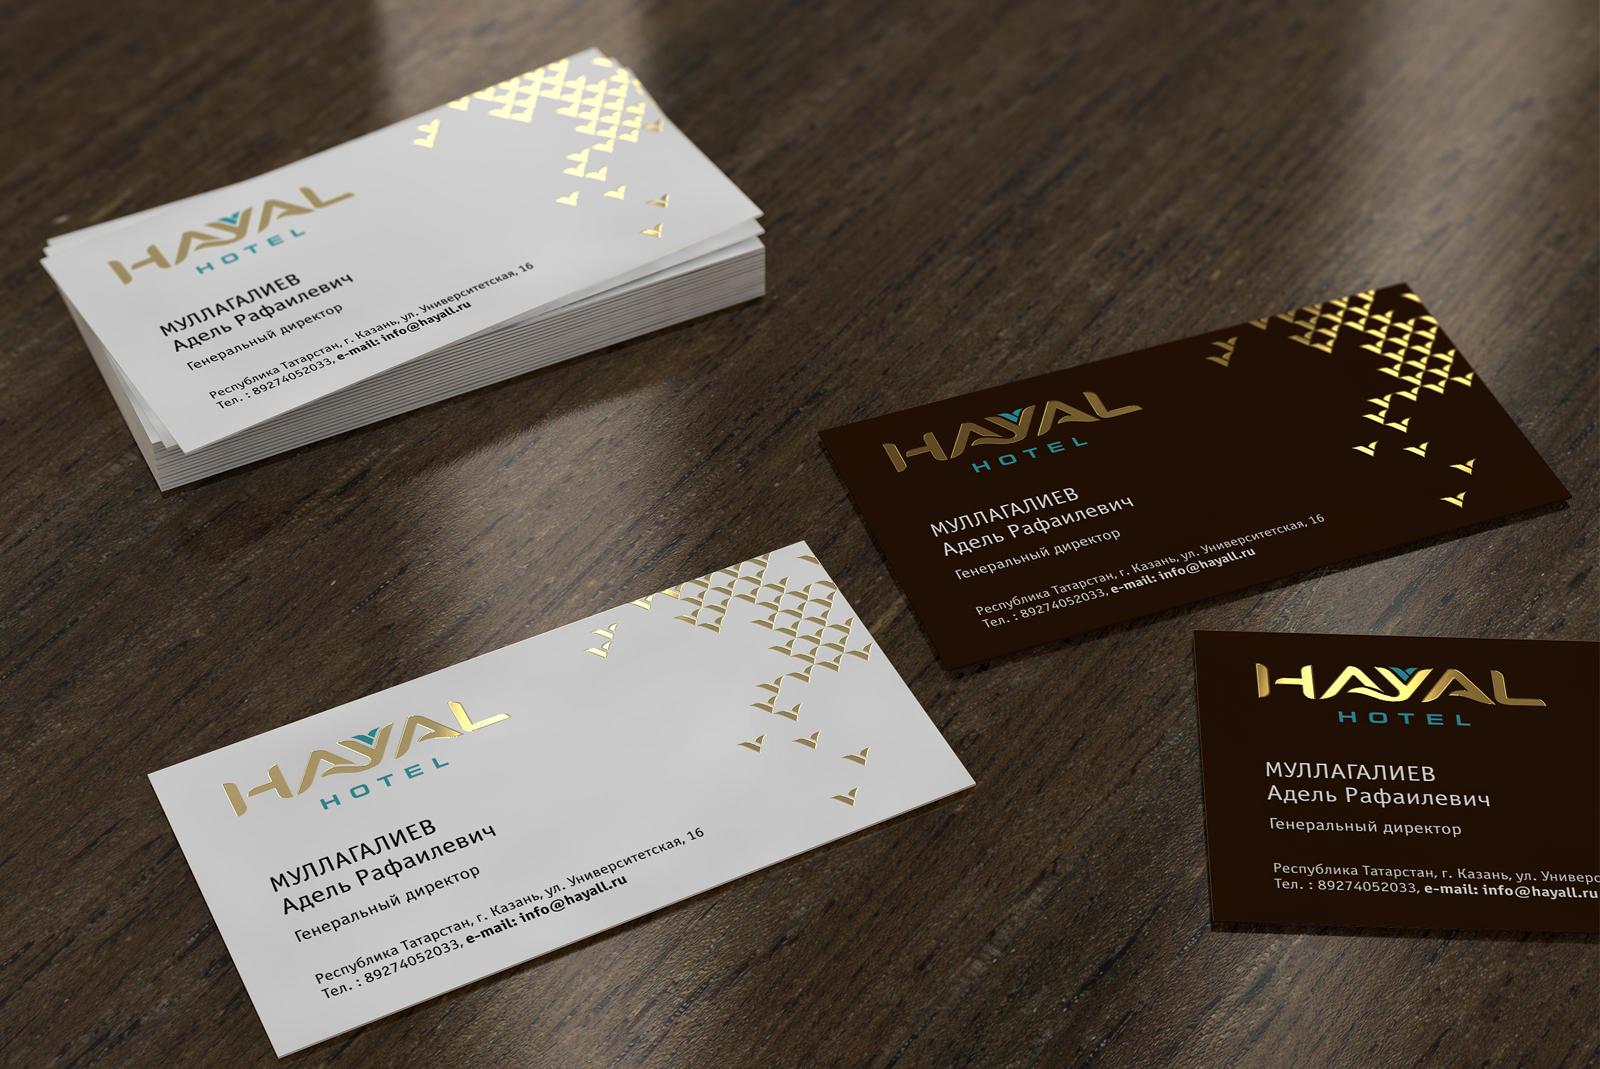 hayal_3